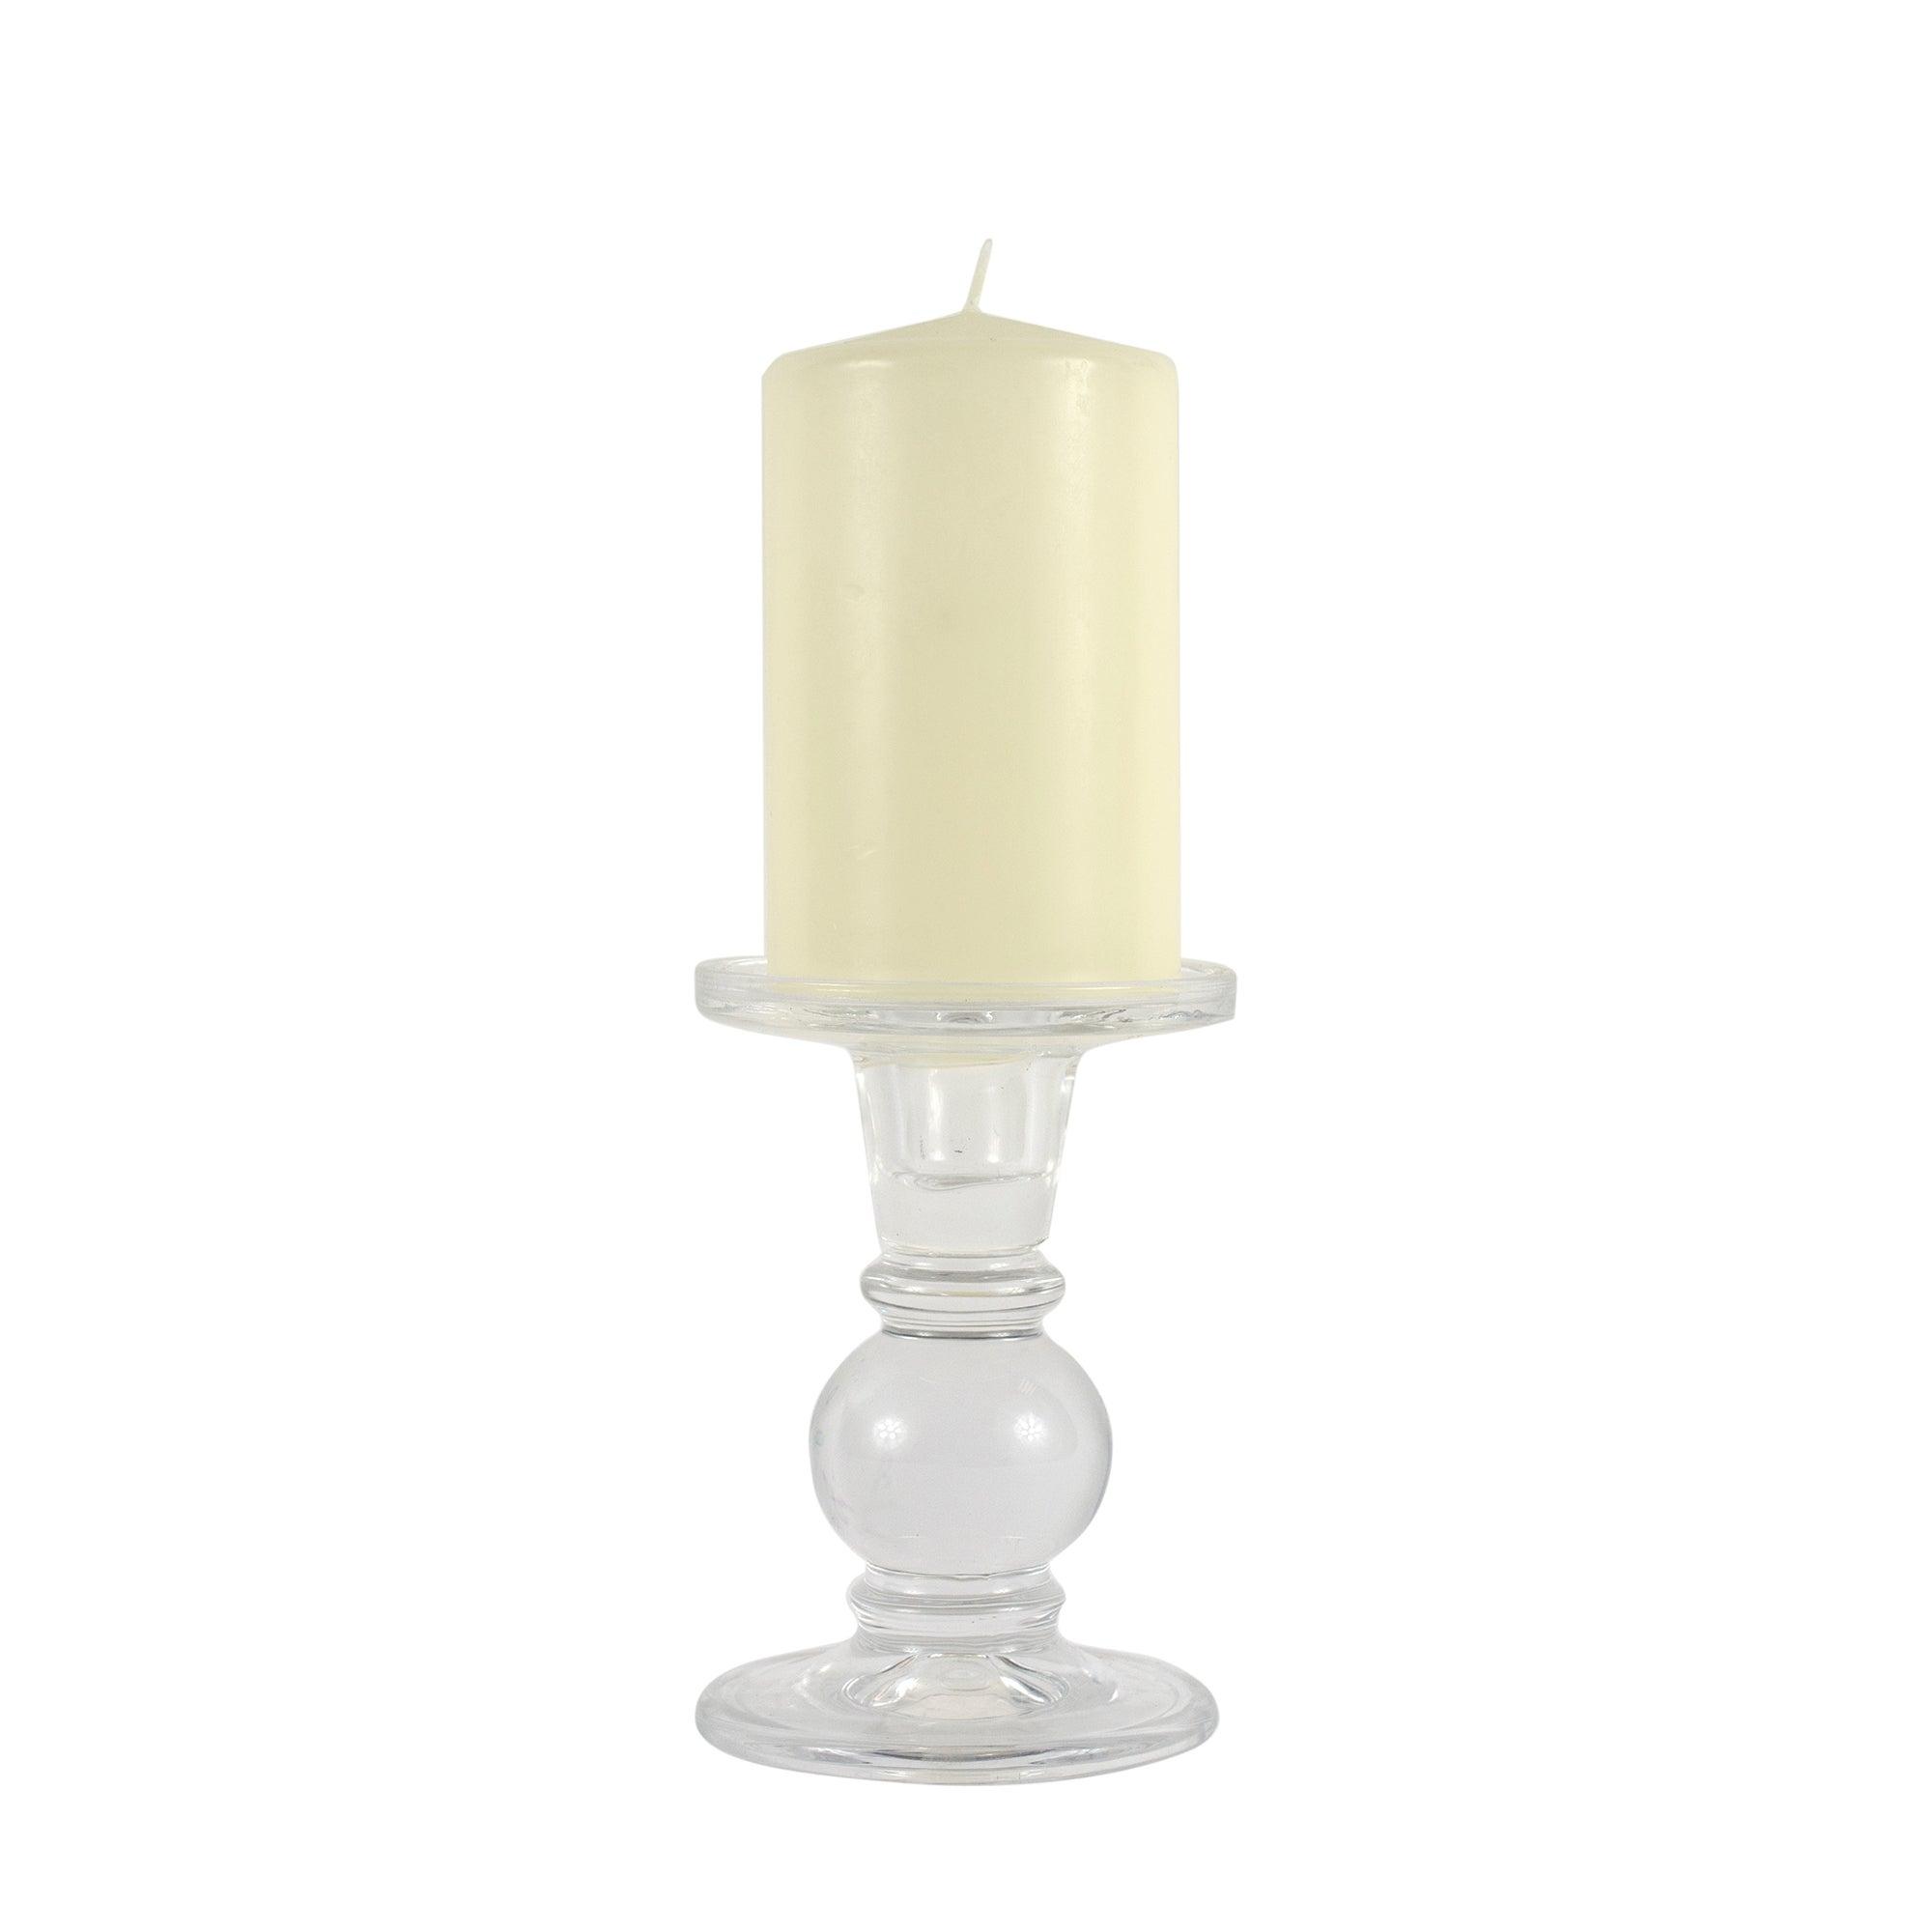 glass candle holder and pillar candle dunelm. Black Bedroom Furniture Sets. Home Design Ideas